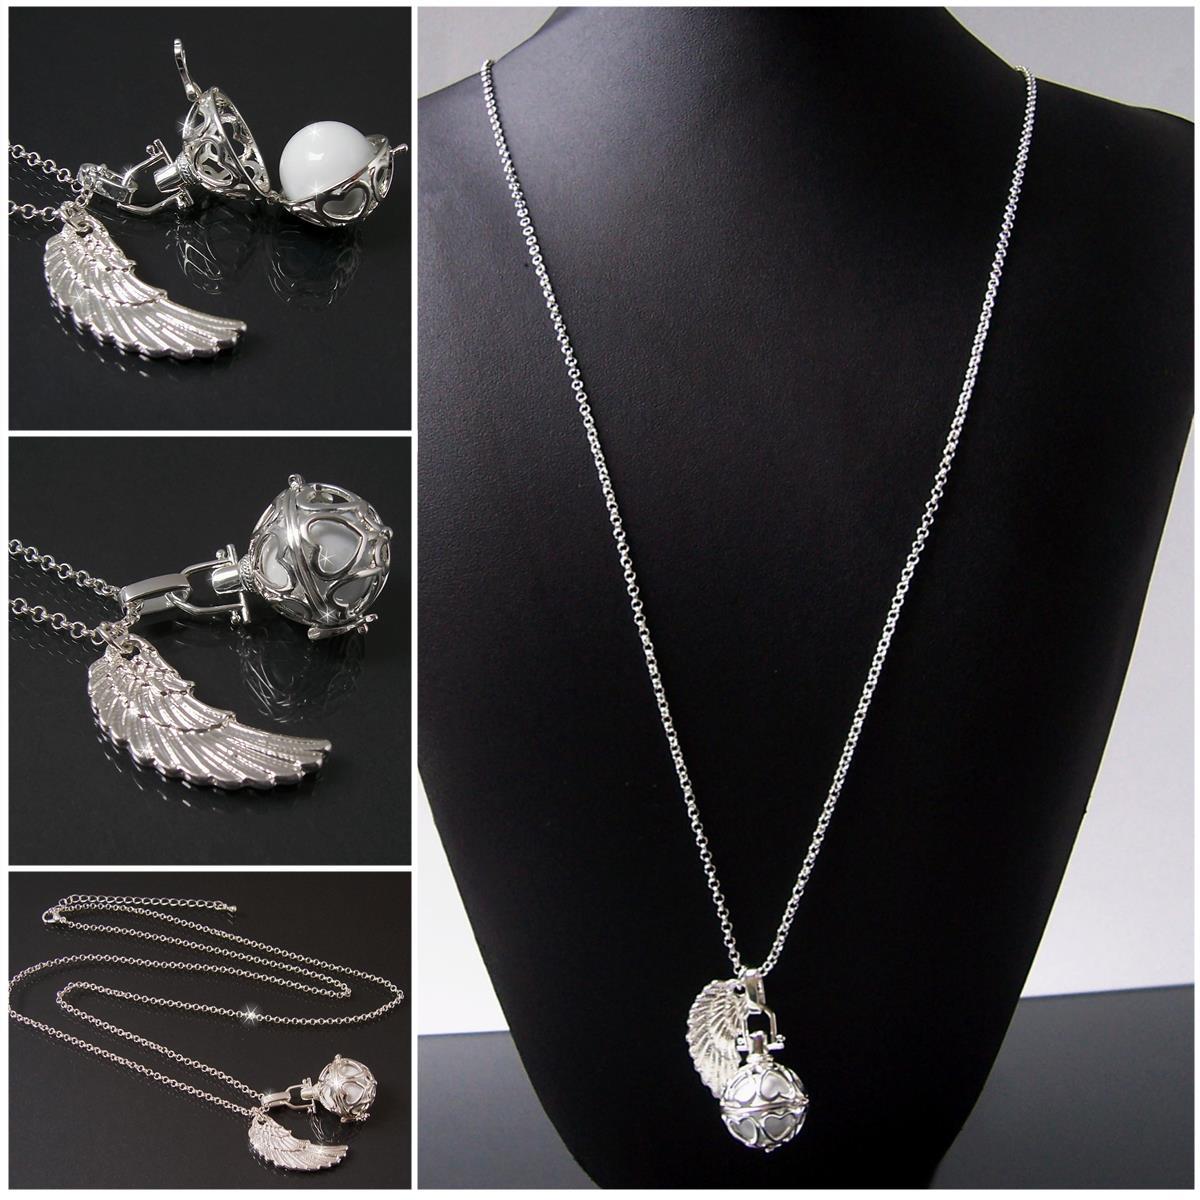 K1051# Schutzengel Halskette 88cm Flügel Silber Klangkugel weiss